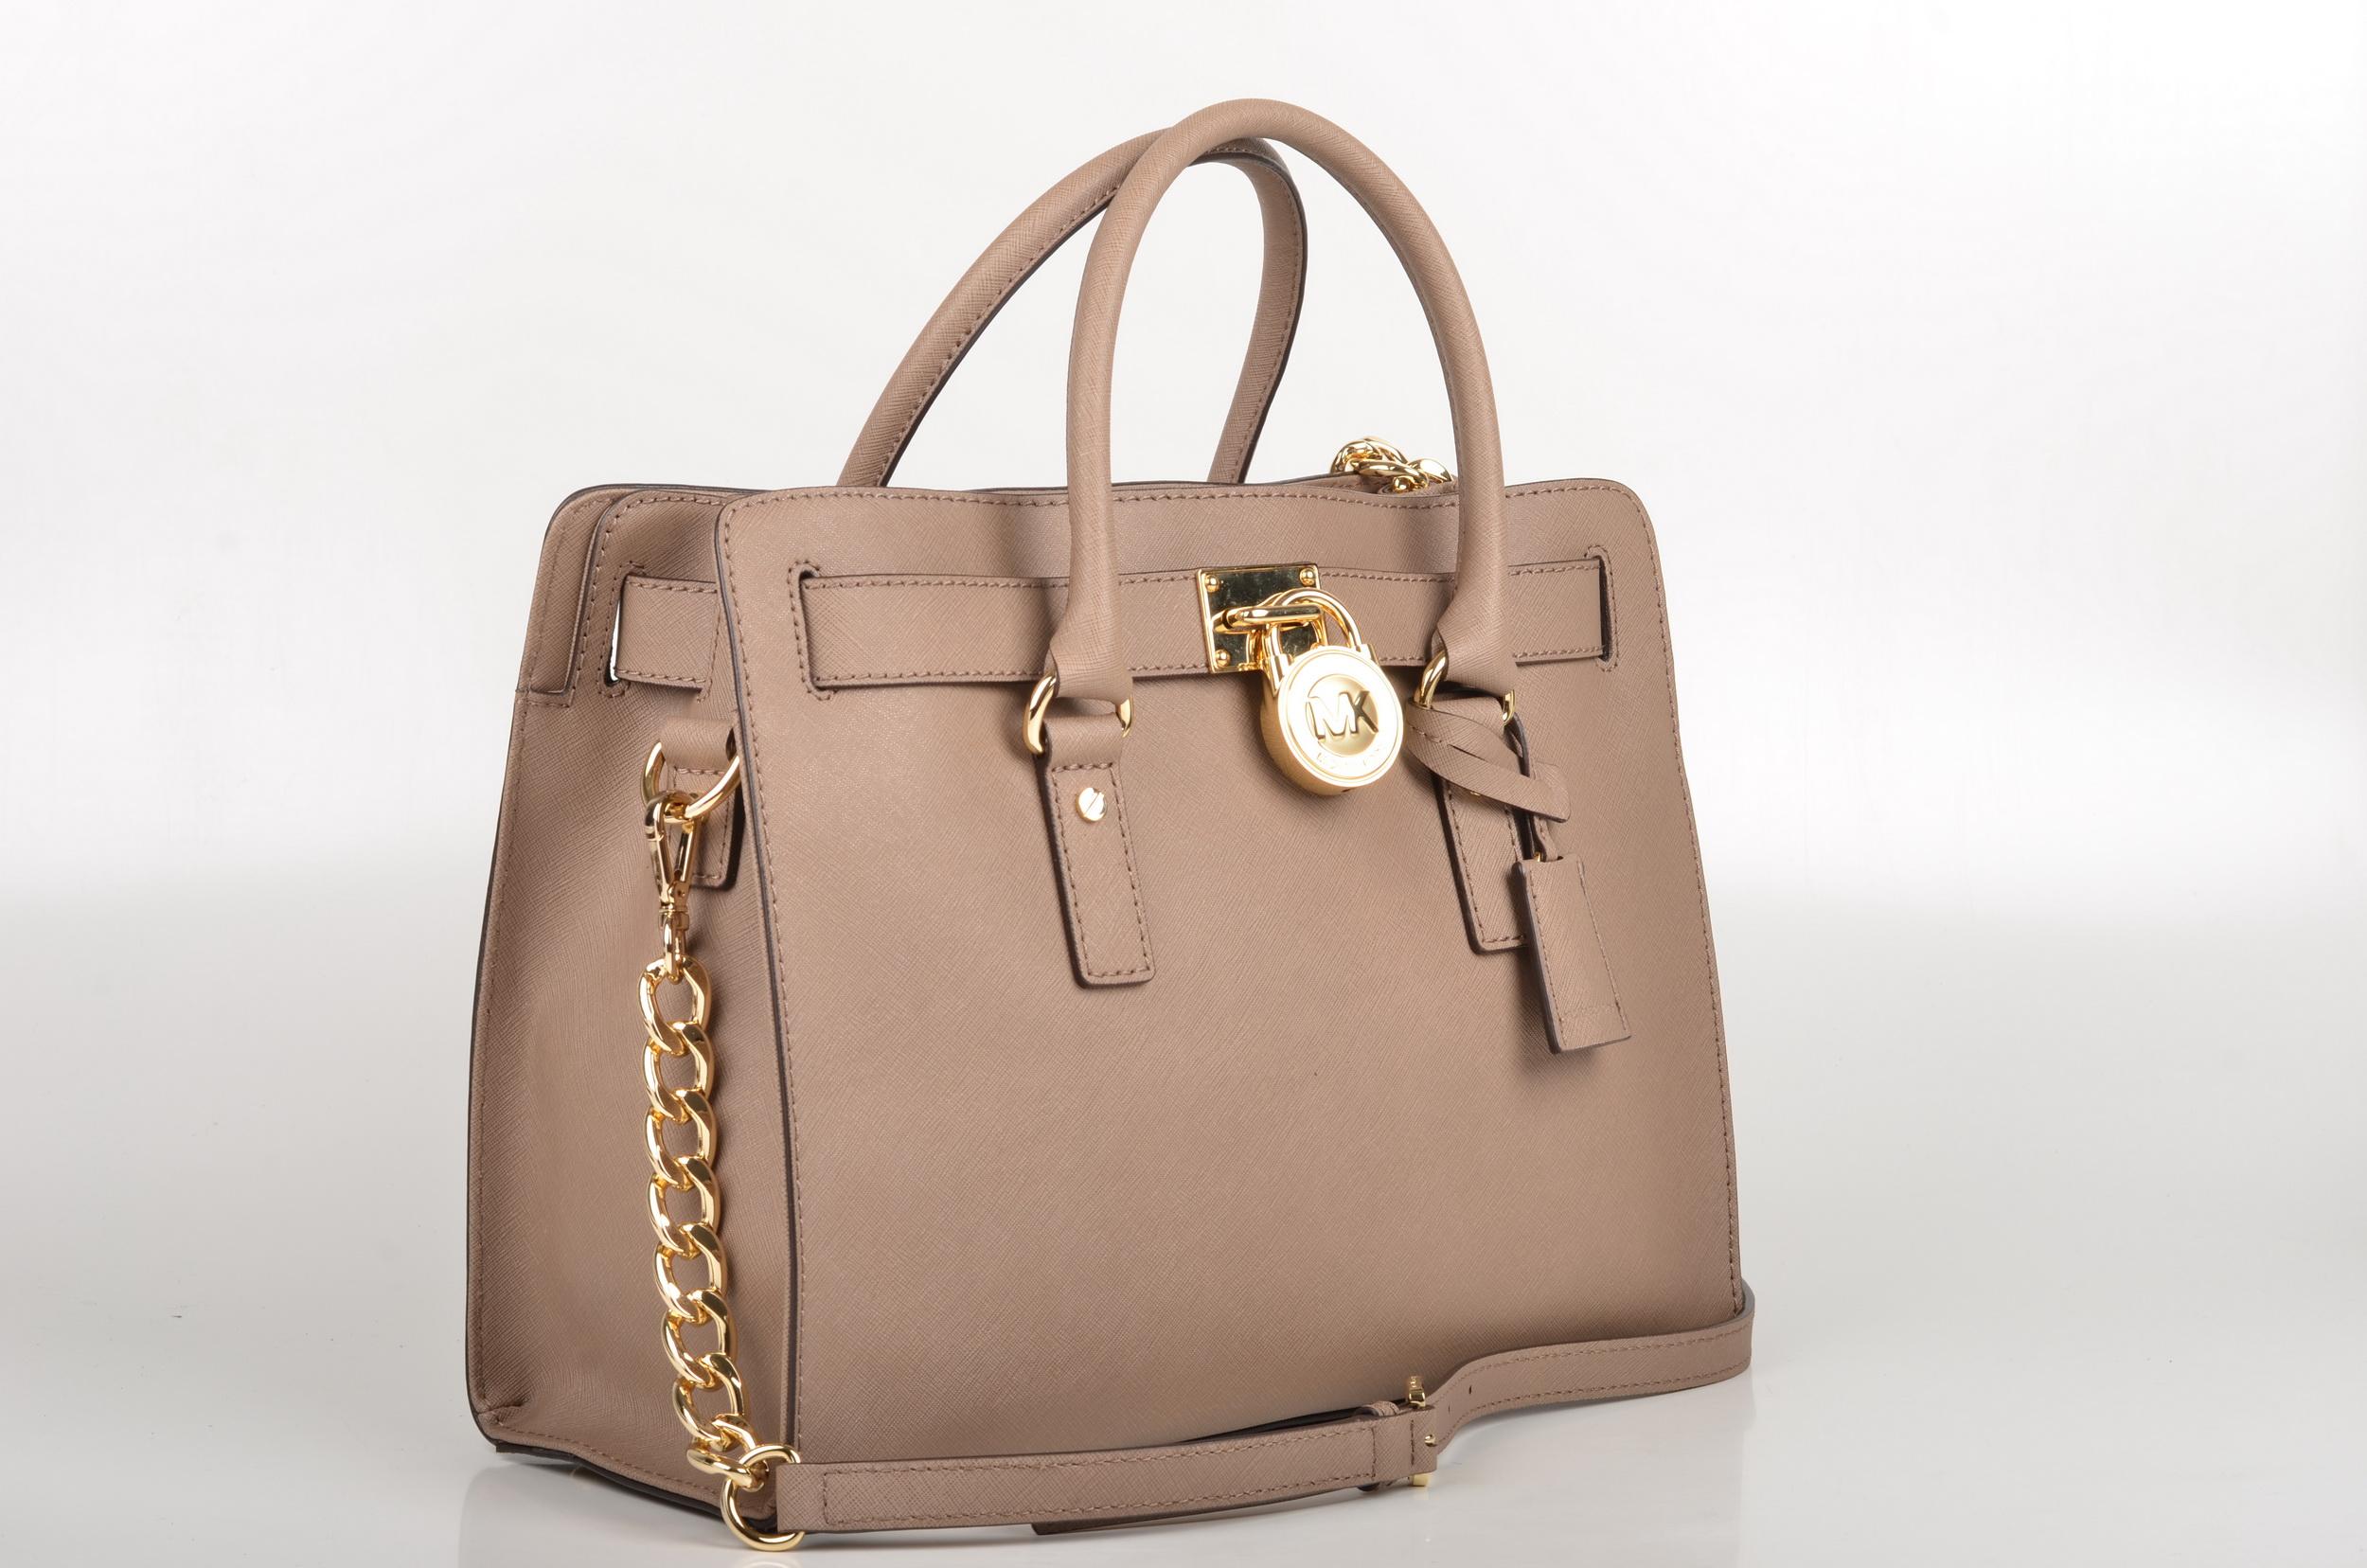 5d6680bb066b Buy michael kors hamilton satchel 2015 > OFF77% Discounted